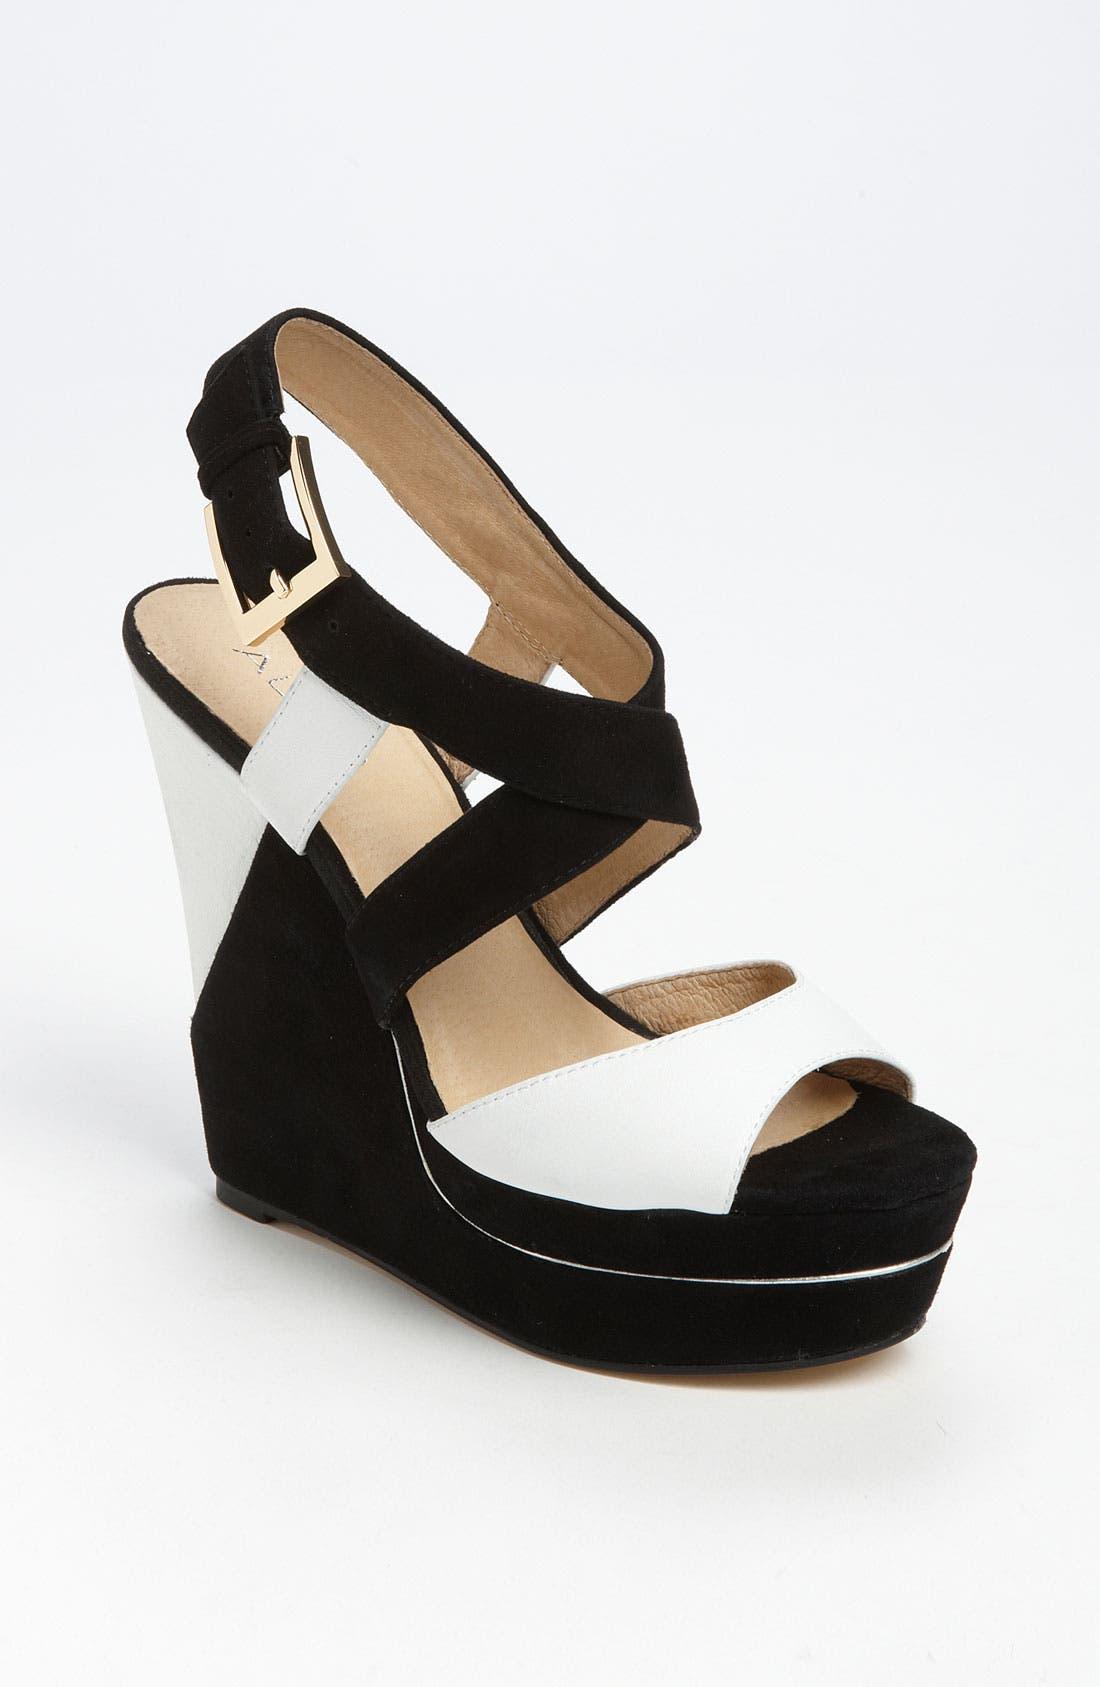 Main Image - ALDO 'Dagraca' Sandal